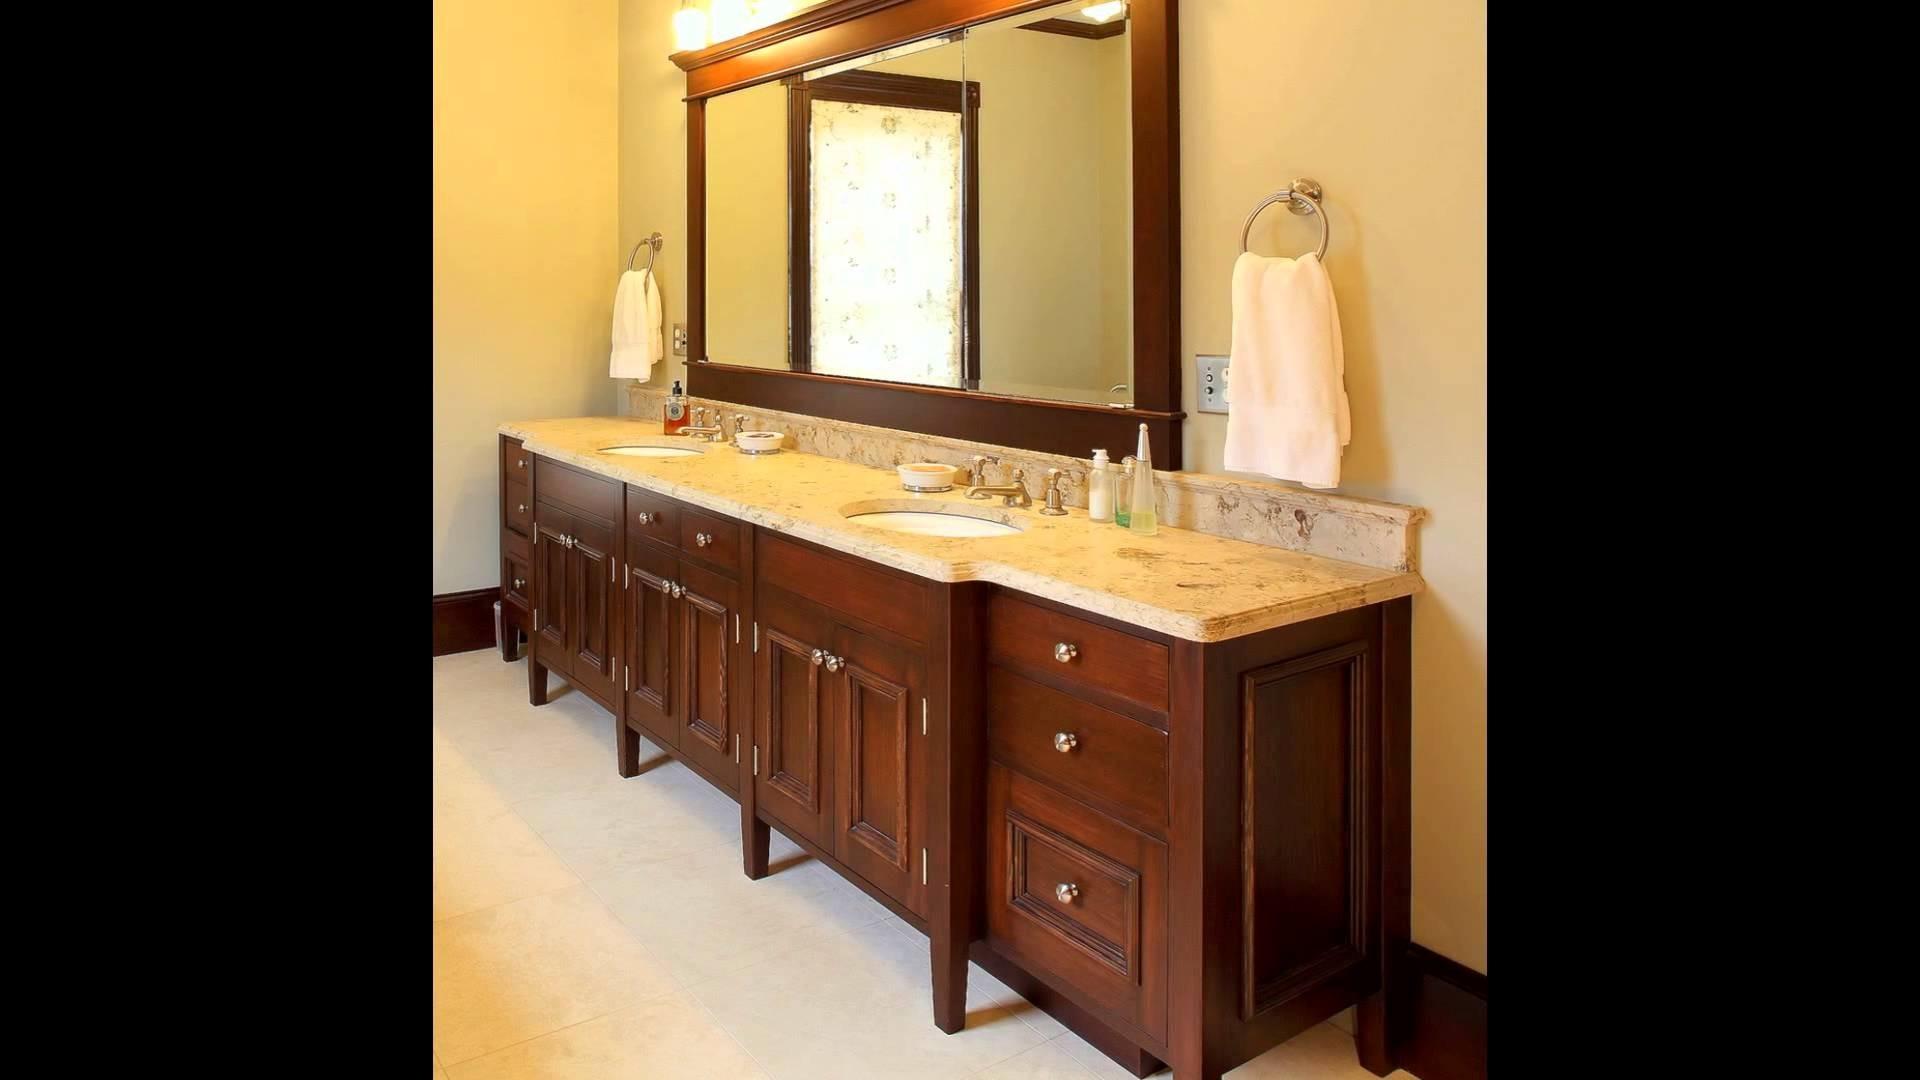 Bathroom Vanity Images Lovely Double Sink Bathroom Vanity Construction